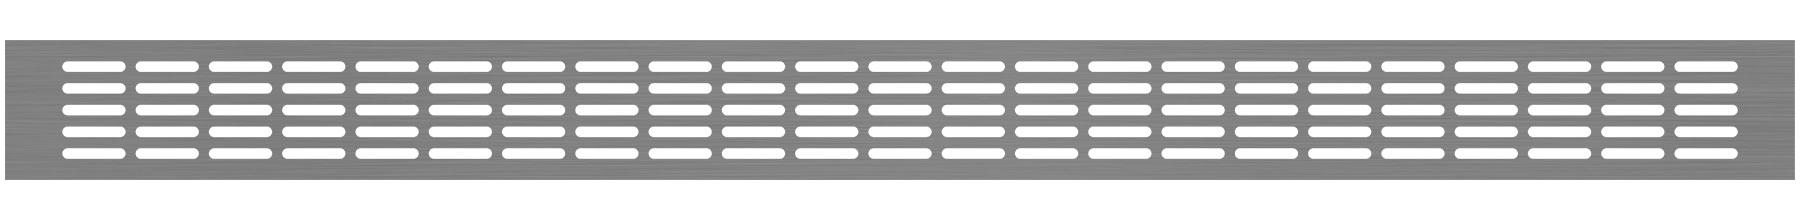 VRS-007 - Ventilaciona rešetka 66×850 mm